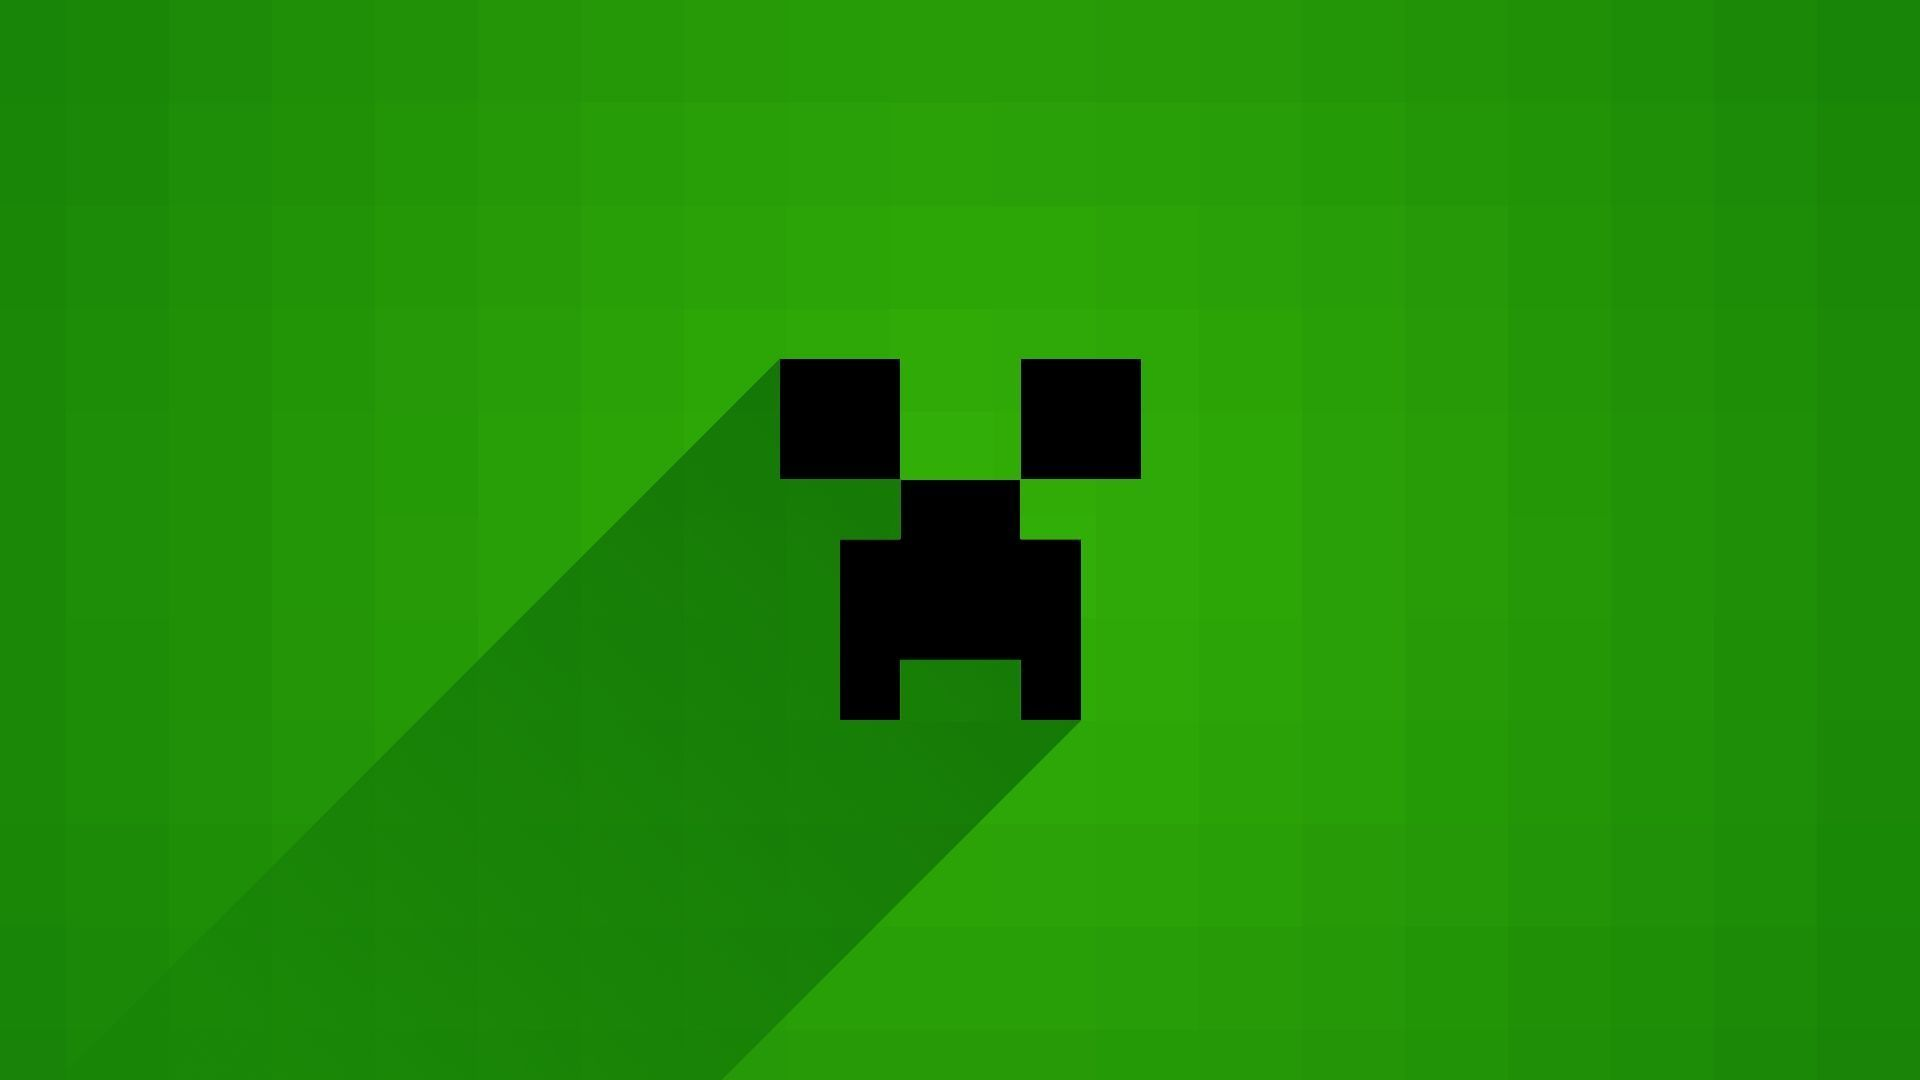 Minecraft Creeper Desktop Wallpapers Blue Minecraft Wallpaper Creepers Wallpaper